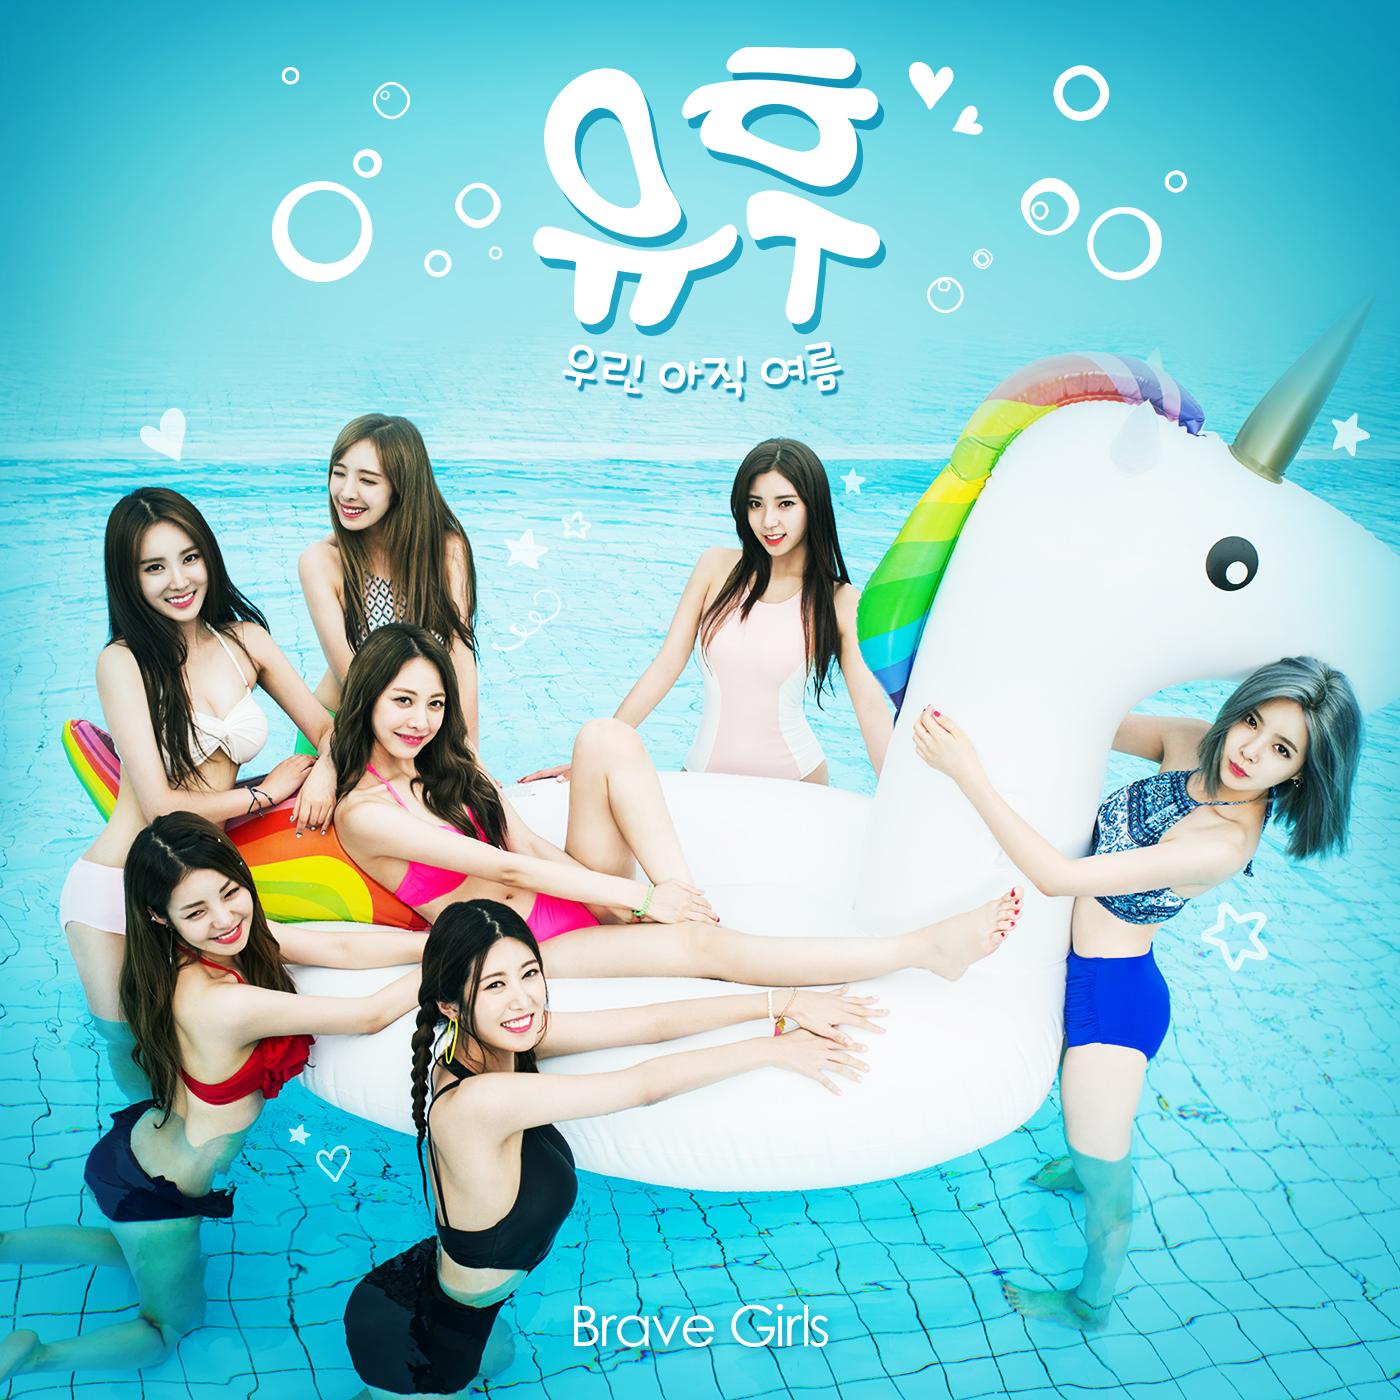 20160907.02.01 Brave Girls - Yoo Hoo cover.jpg